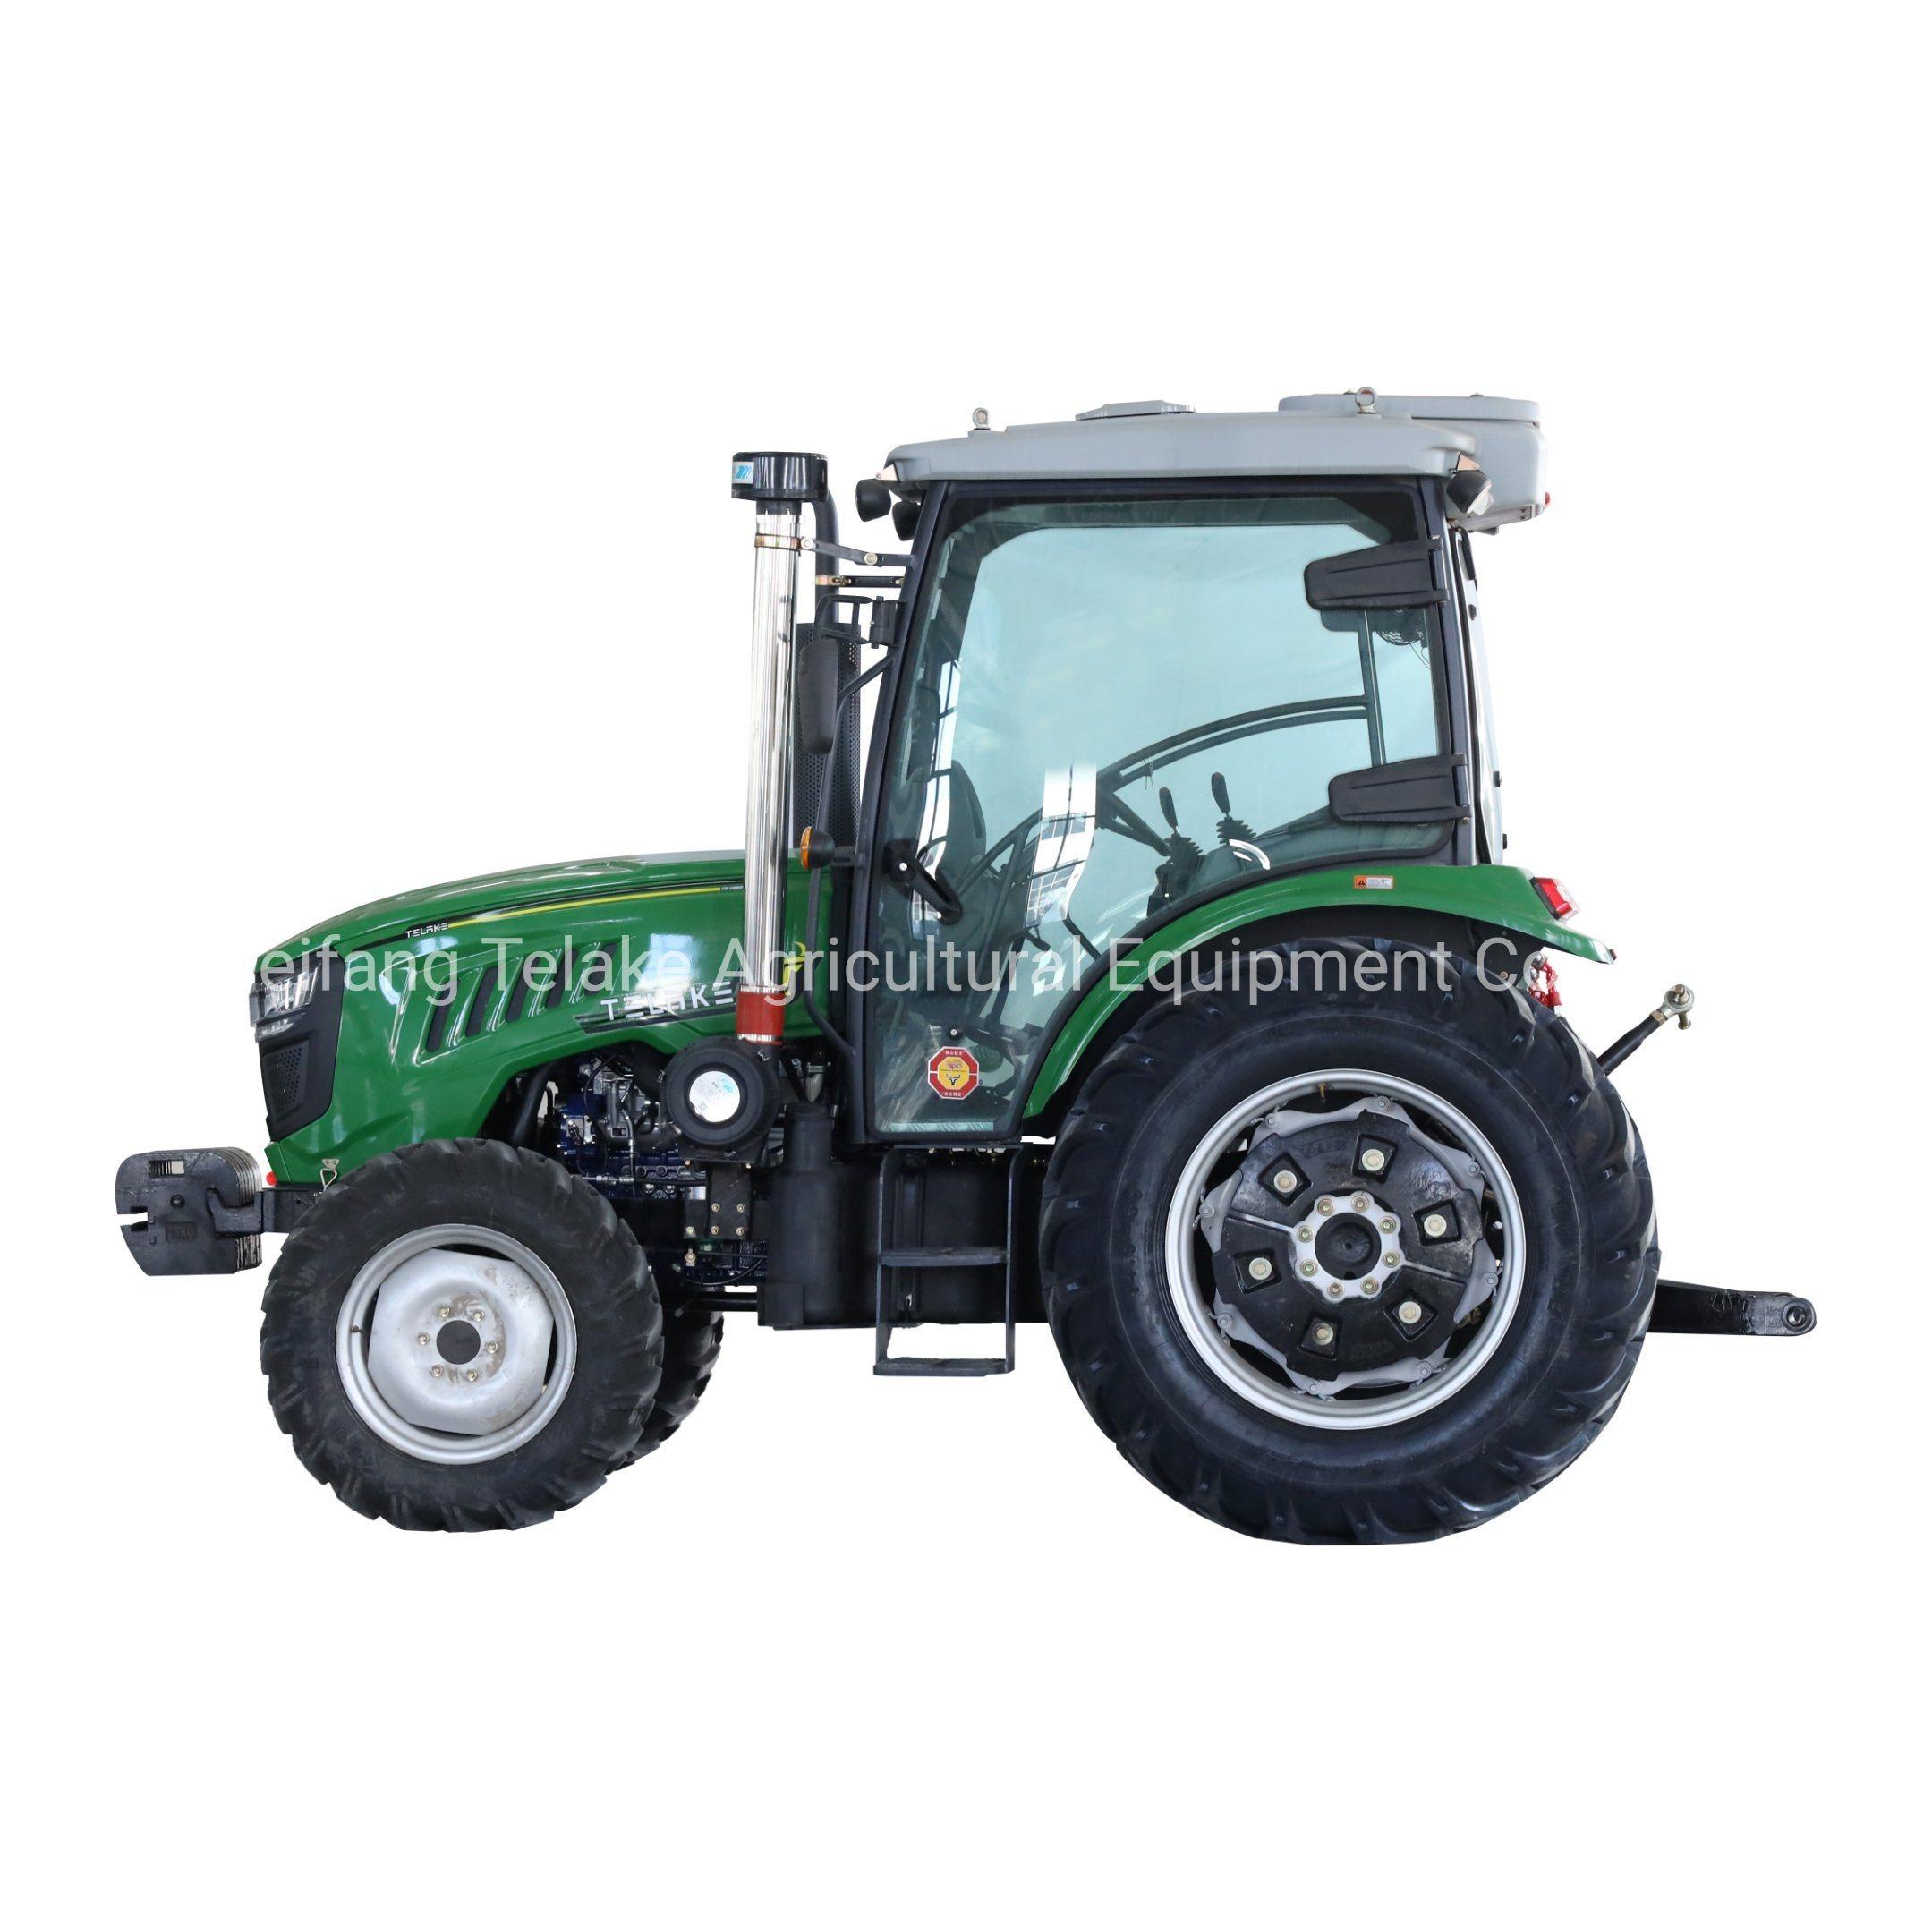 Telake Mini Farm Tractor 4wd 80hp 90hp 100hp Agricultural Tractor China Tractor Farm Tractor Made In China Com